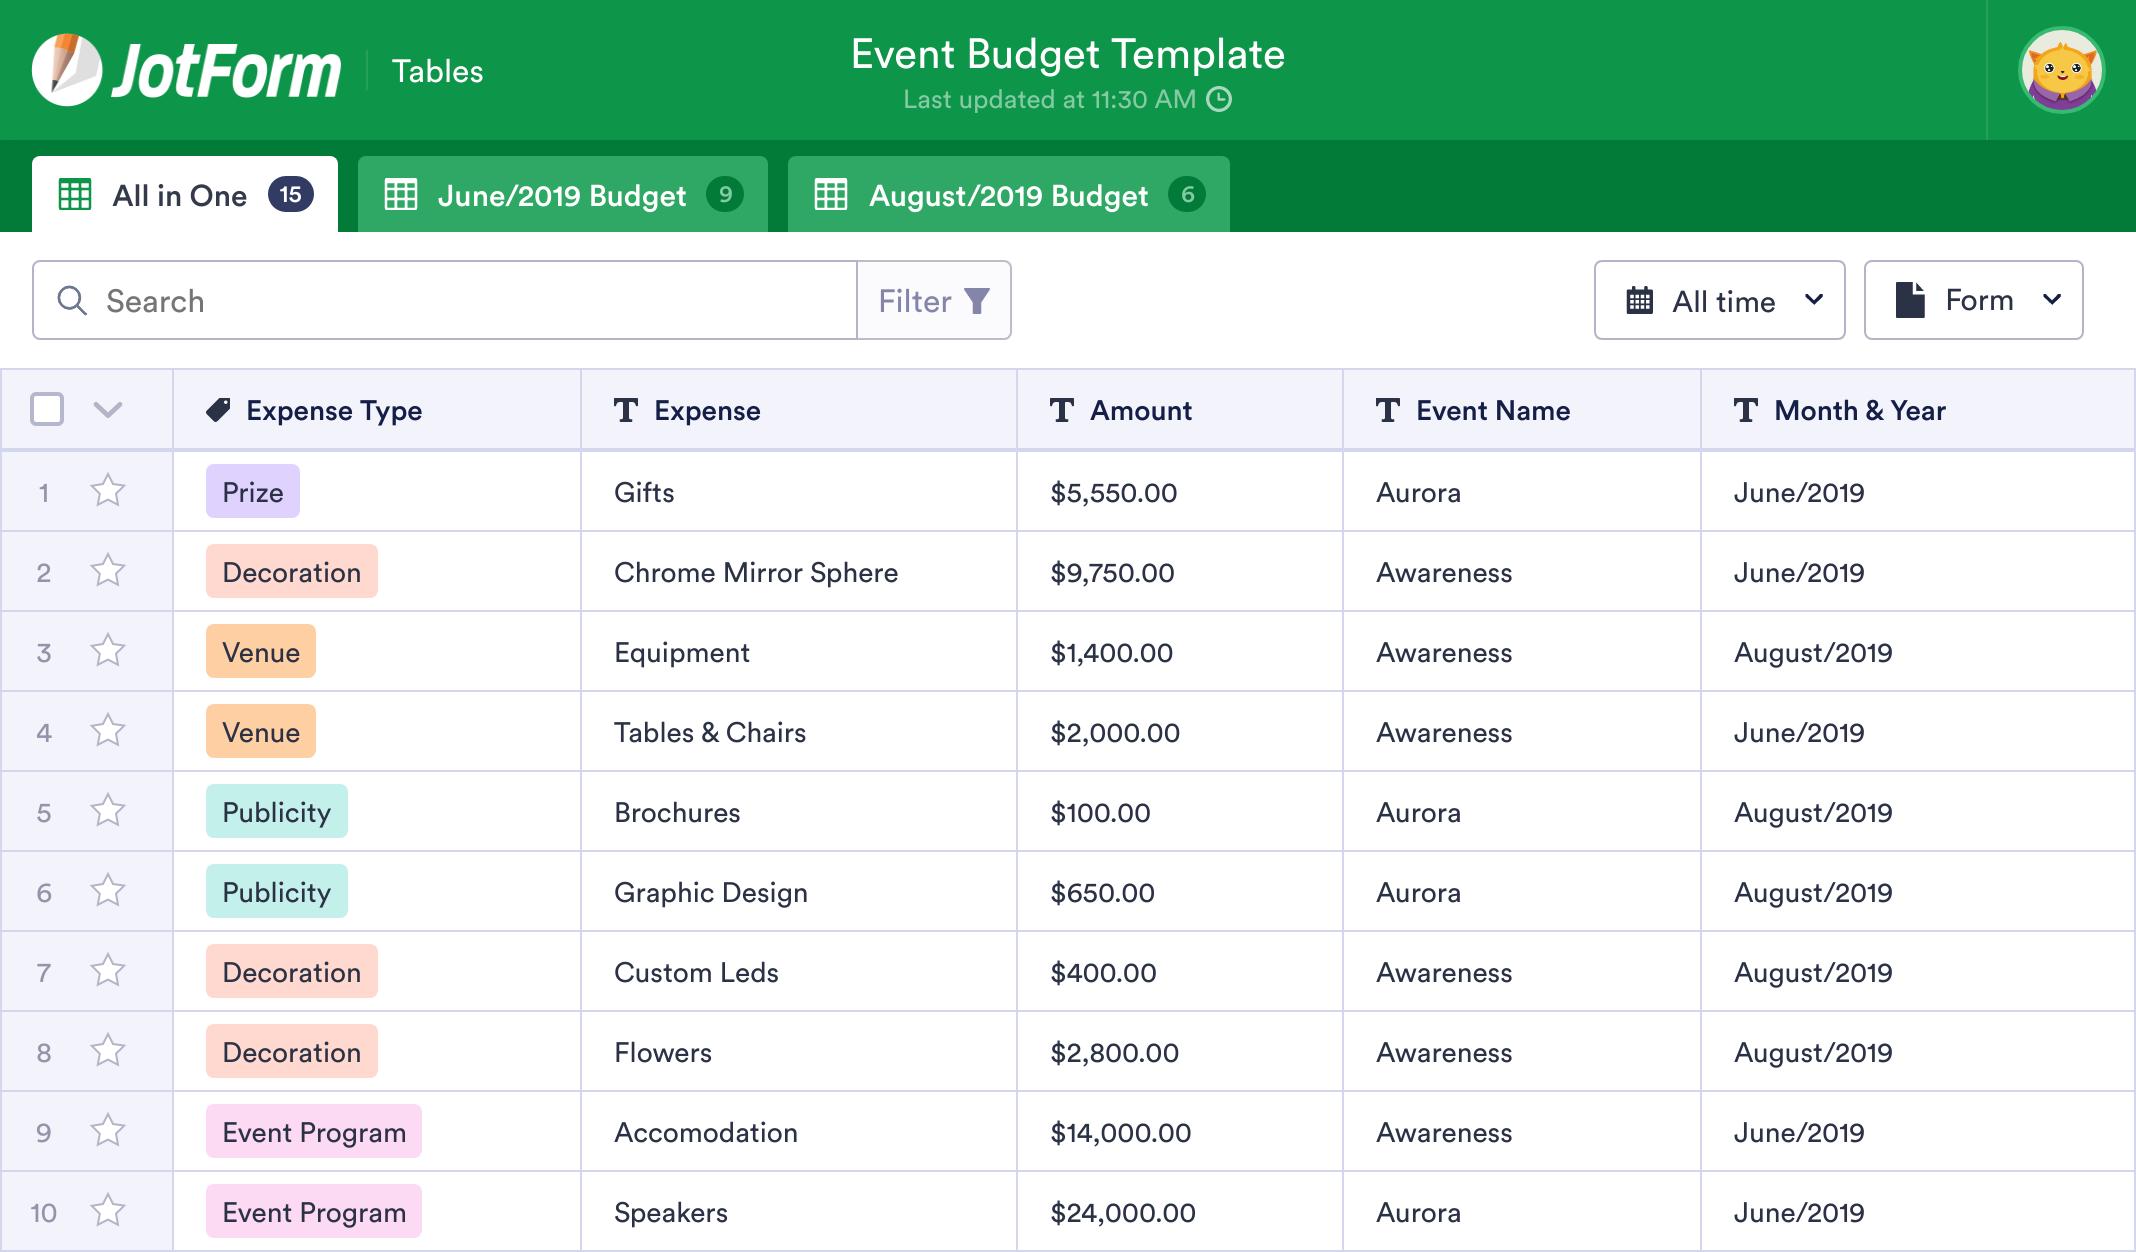 Event Budget Template Jotform Tables